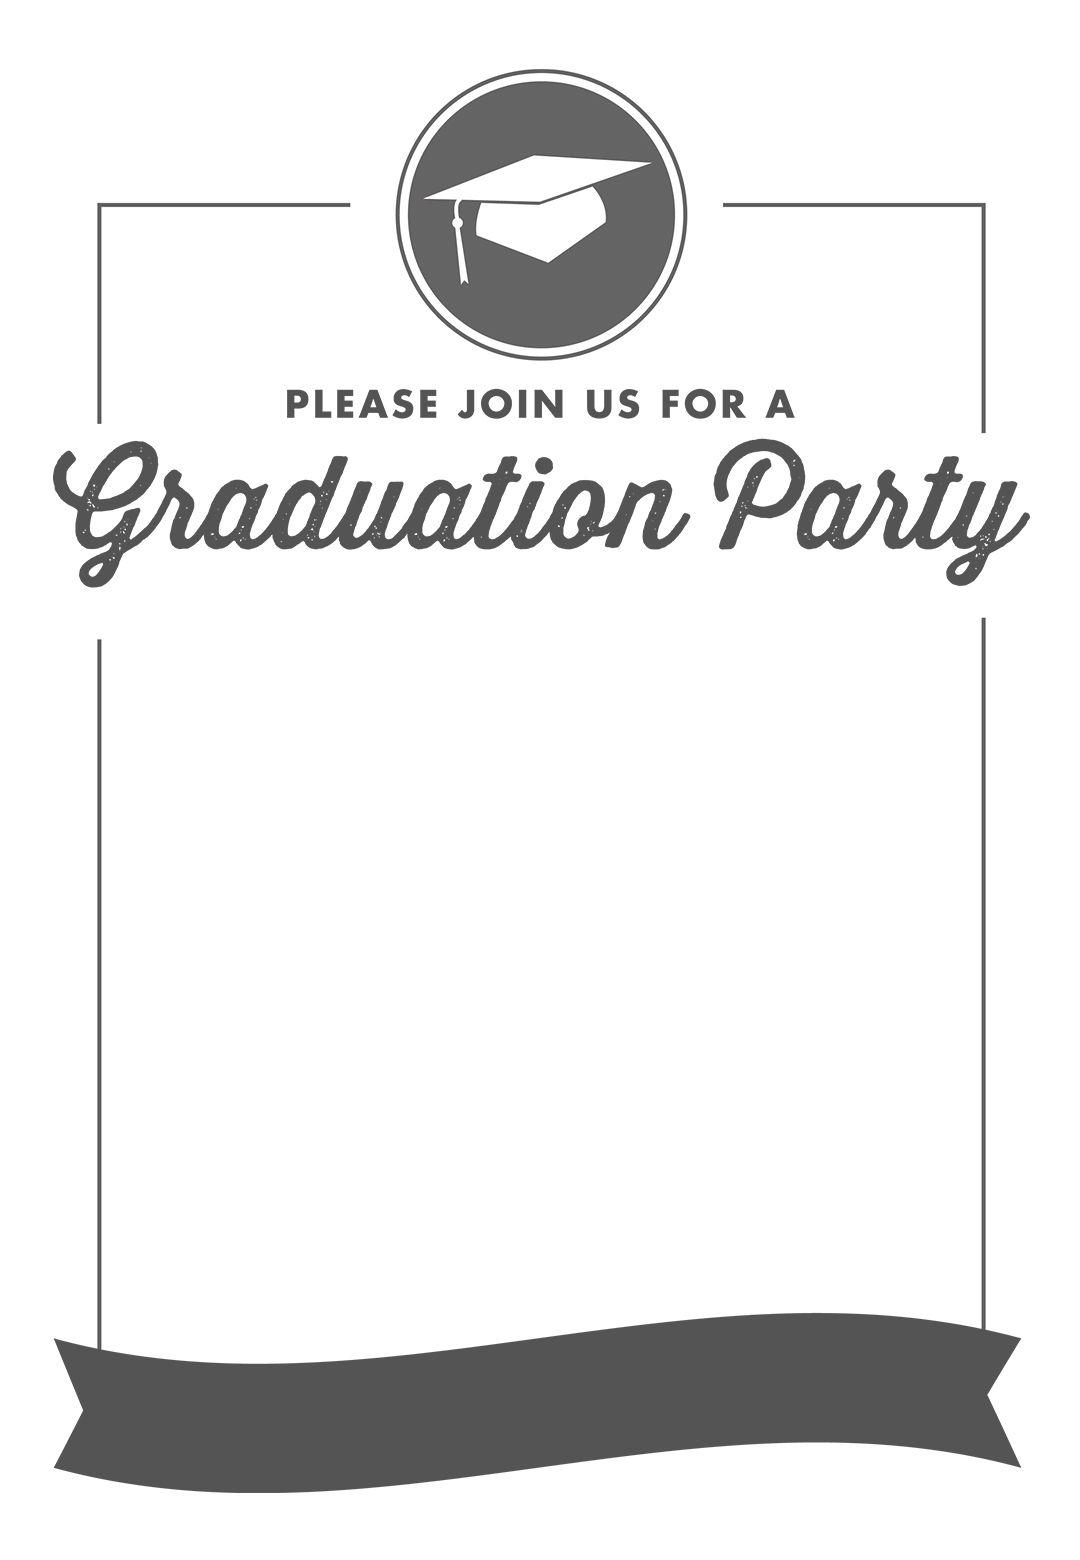 Free Printable Graduation Party Invitation Template | Greetings - Free Printable Graduation Party Invitations